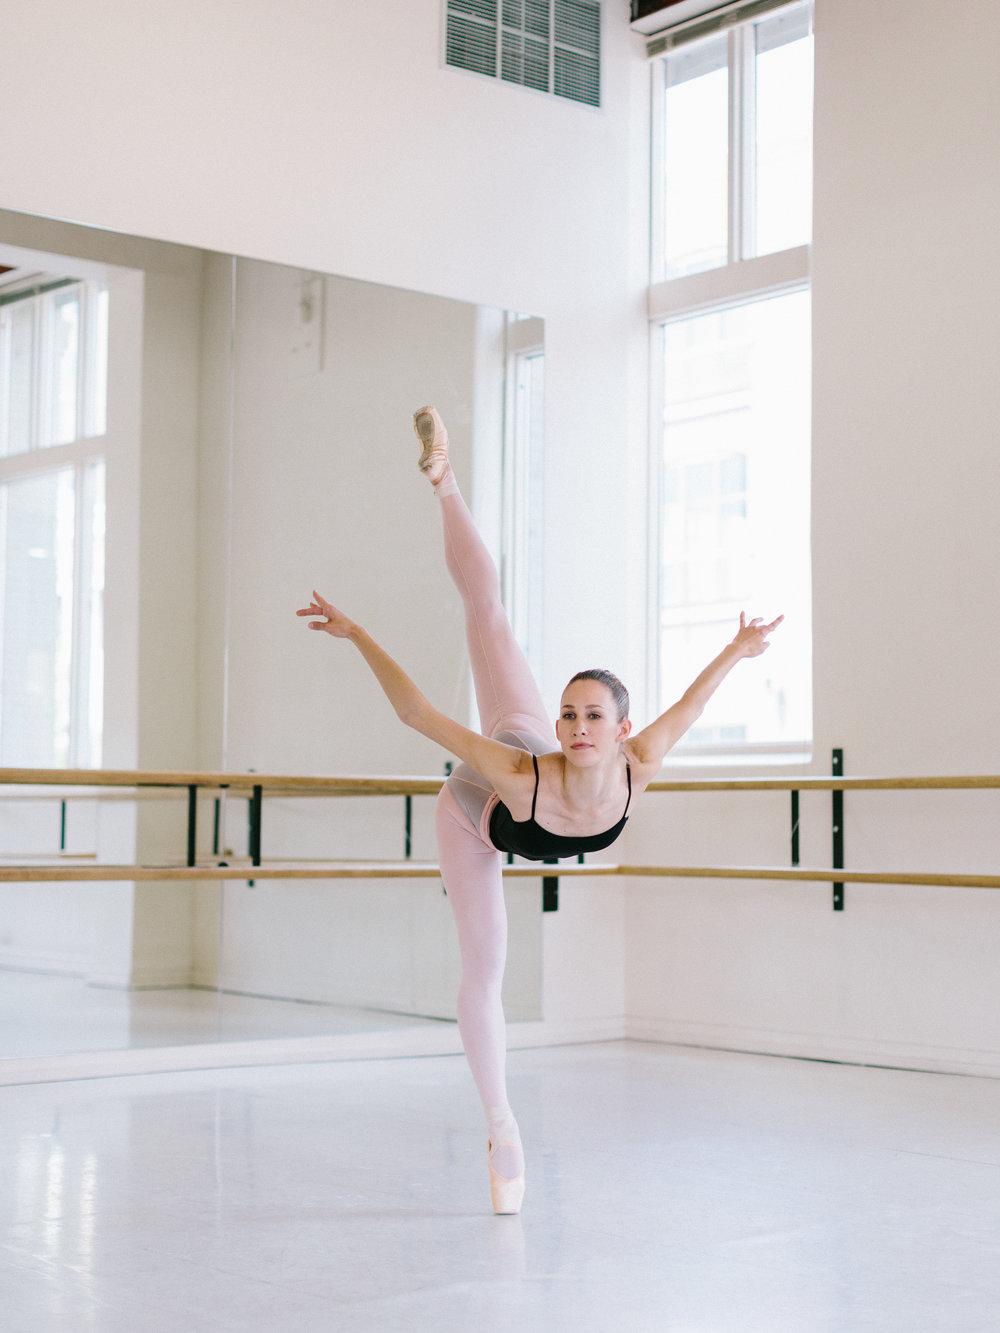 Jessica_Ballet-15.JPG